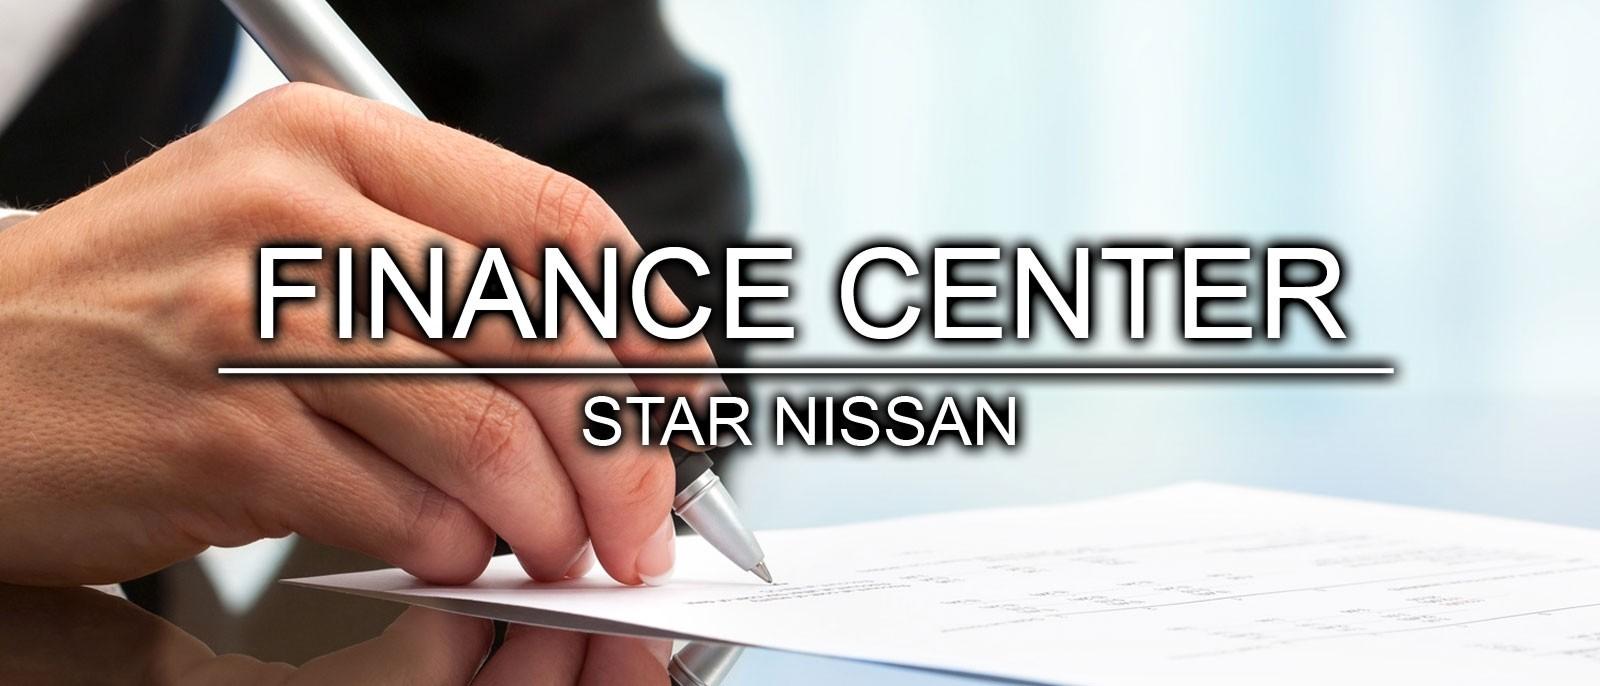 Star Nissan Finance Center